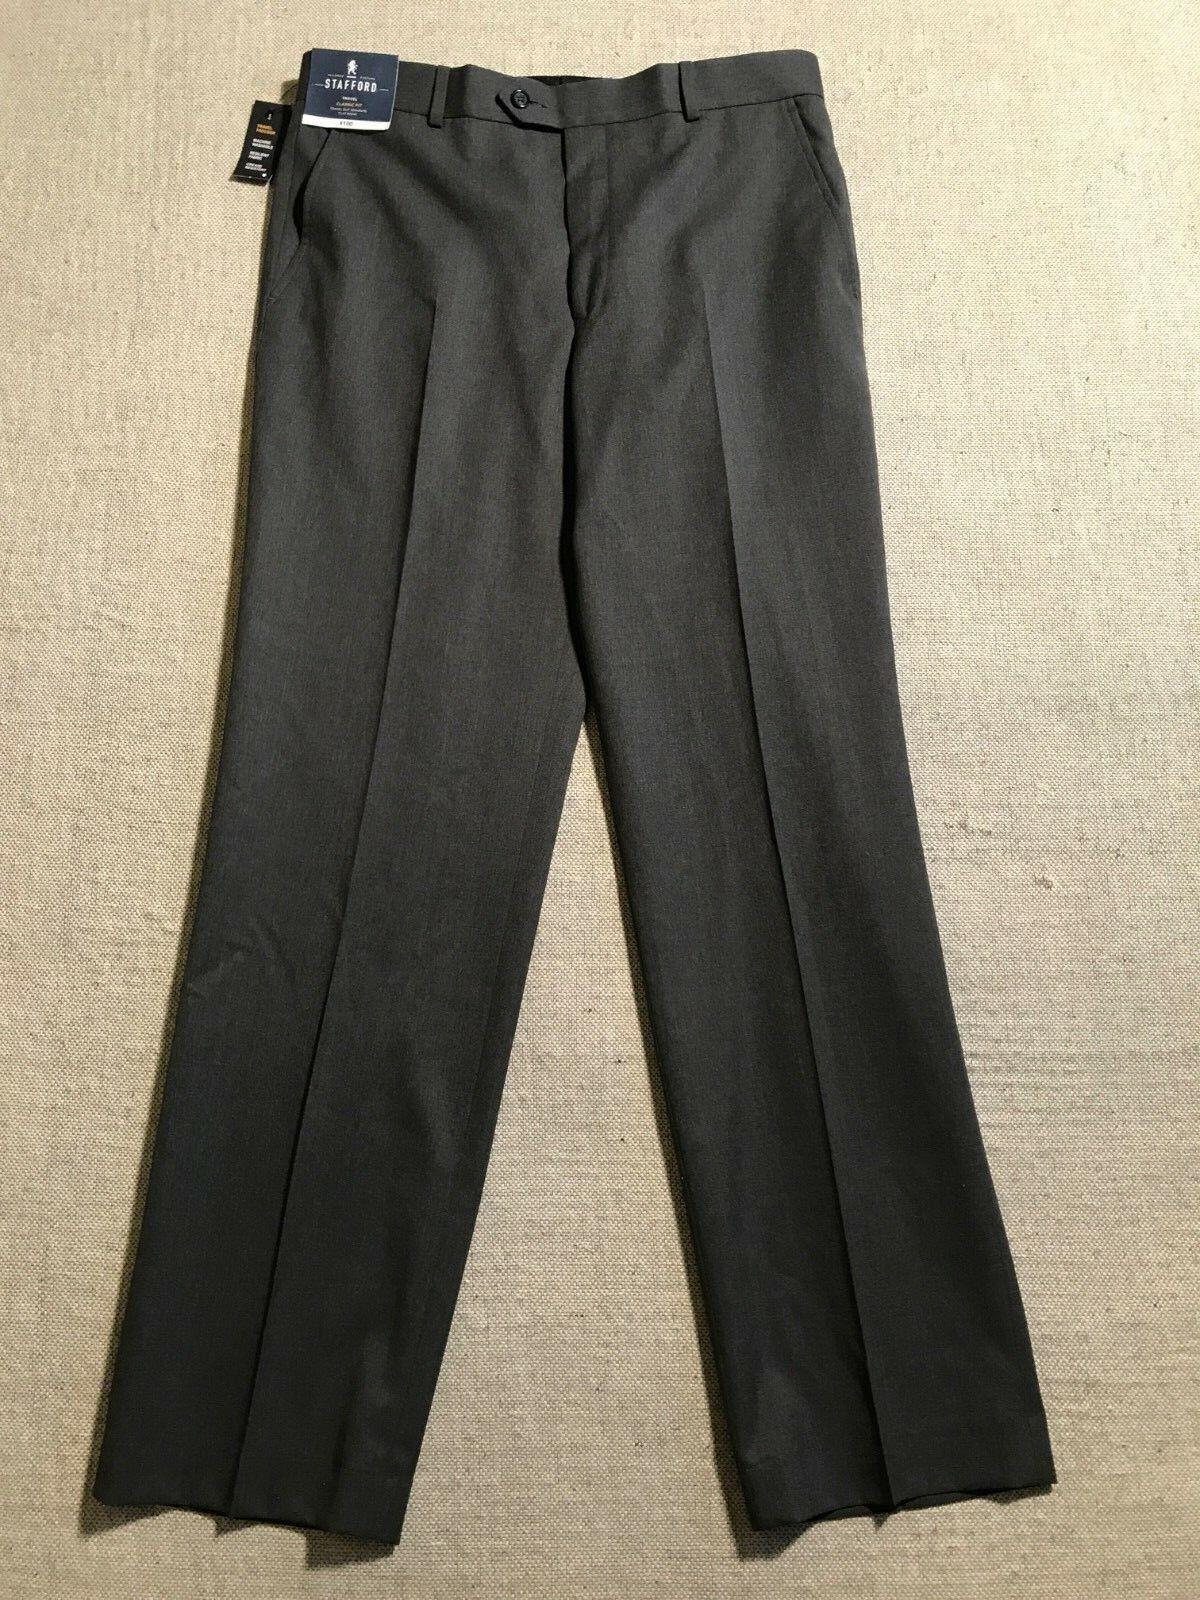 Stafford Men's Tailored Culture Classic Fit Trouser Pants Sz 34x32  K2